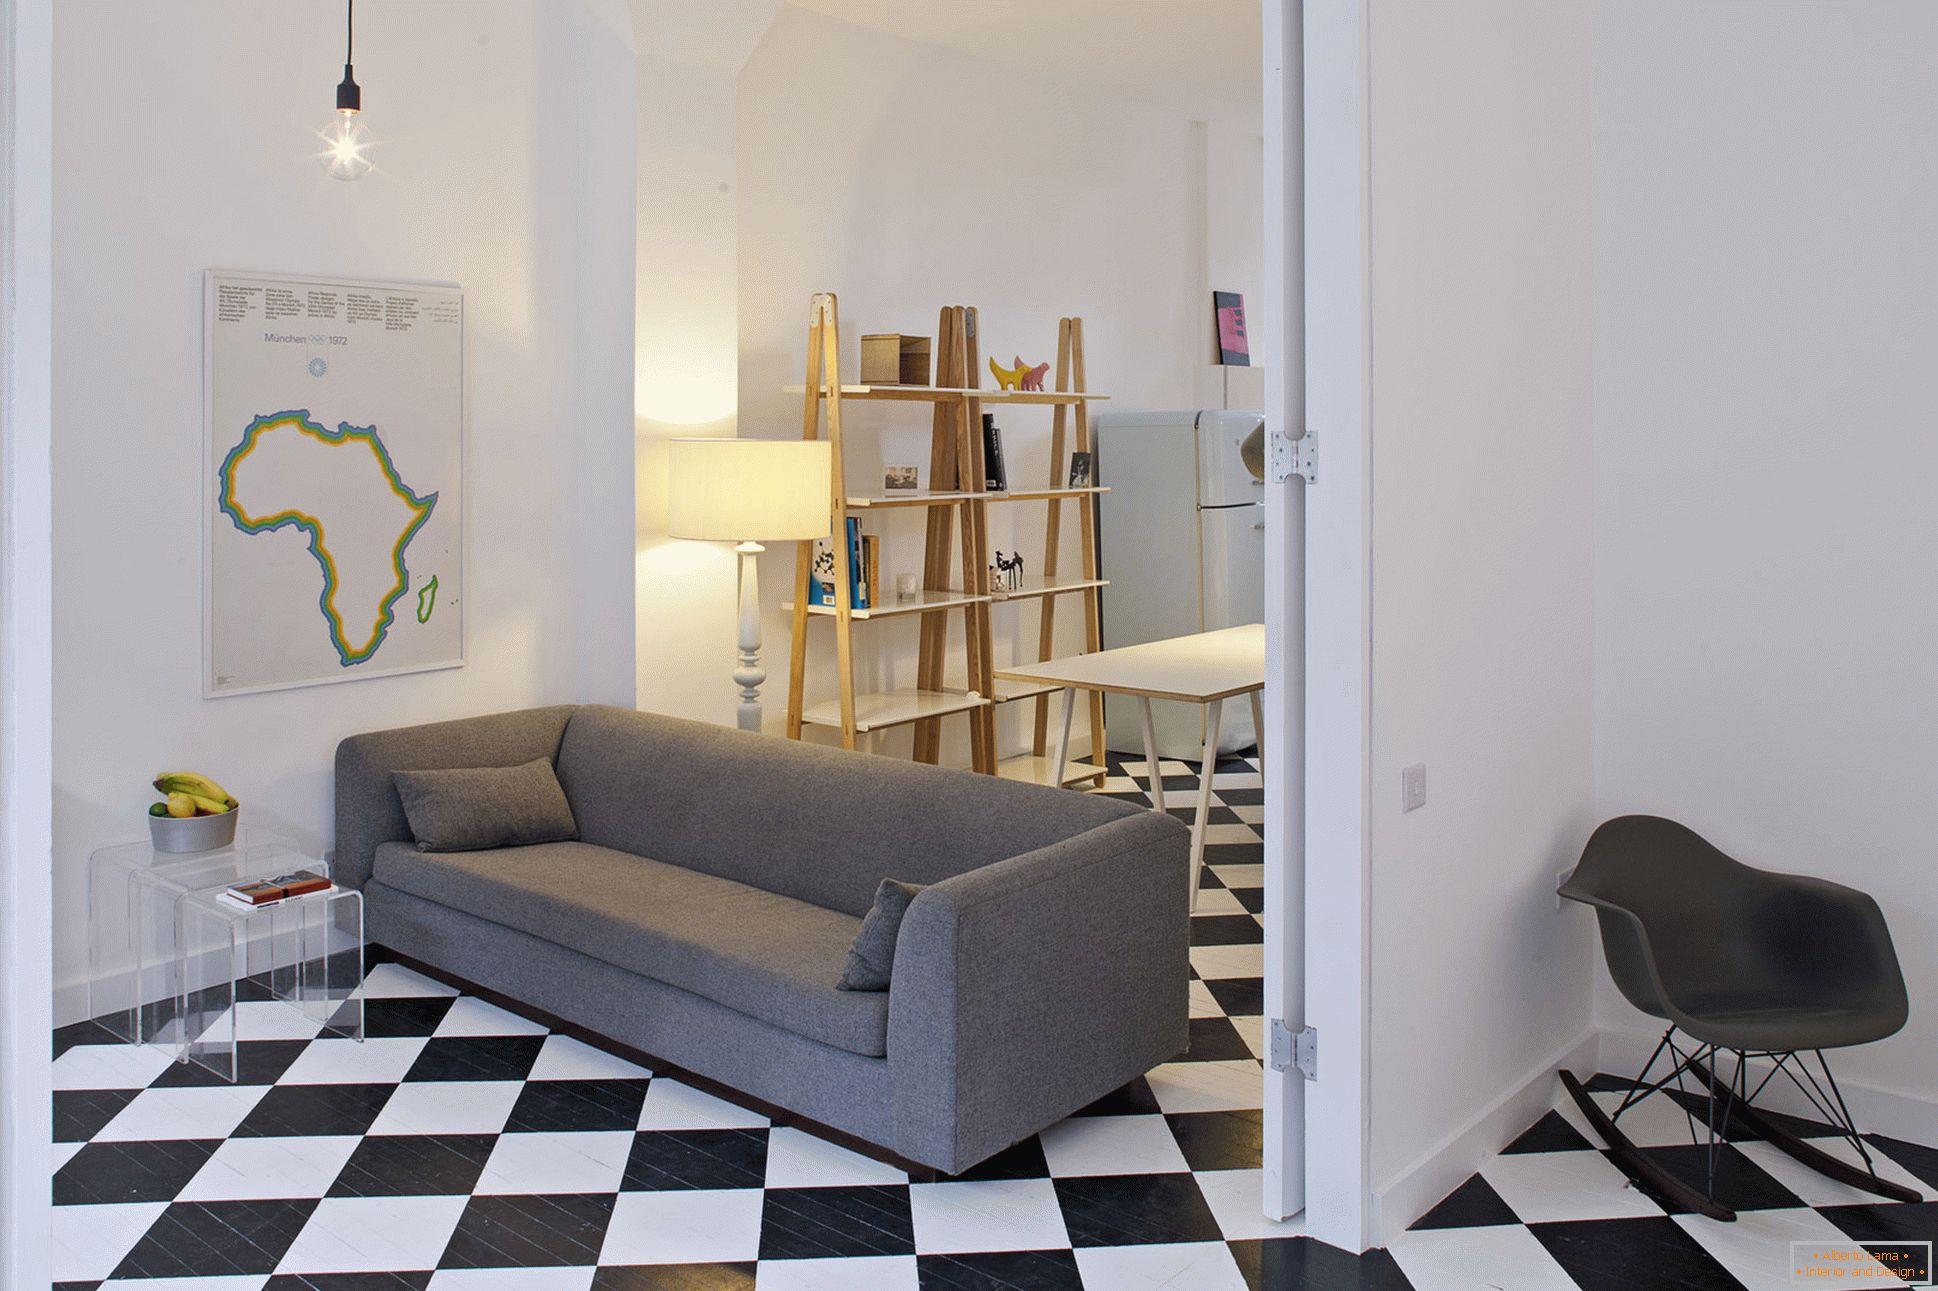 Wonderful interior of a small studio apartment in the loft